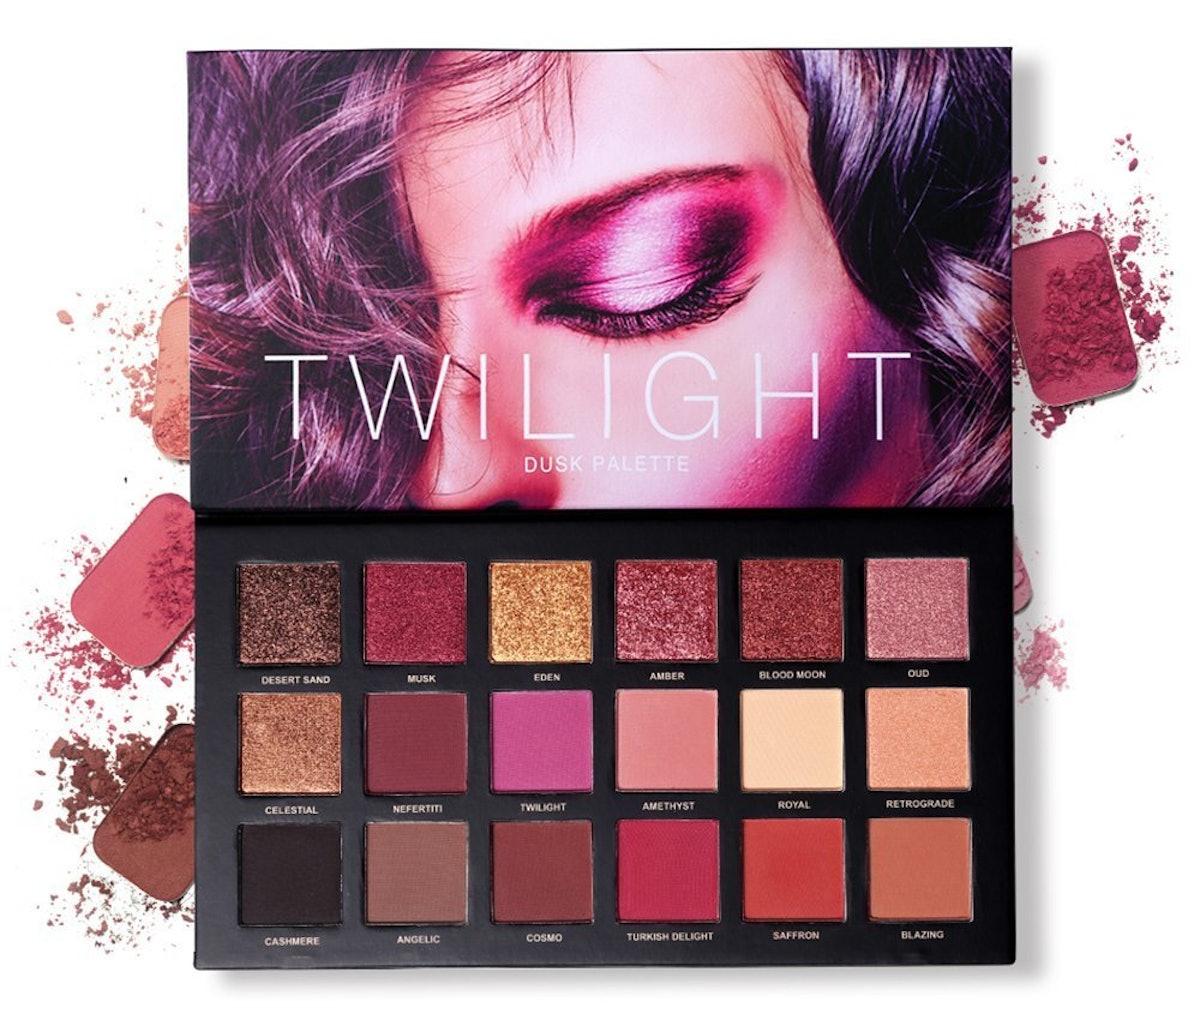 UCANBE Twilight Dusk Palette